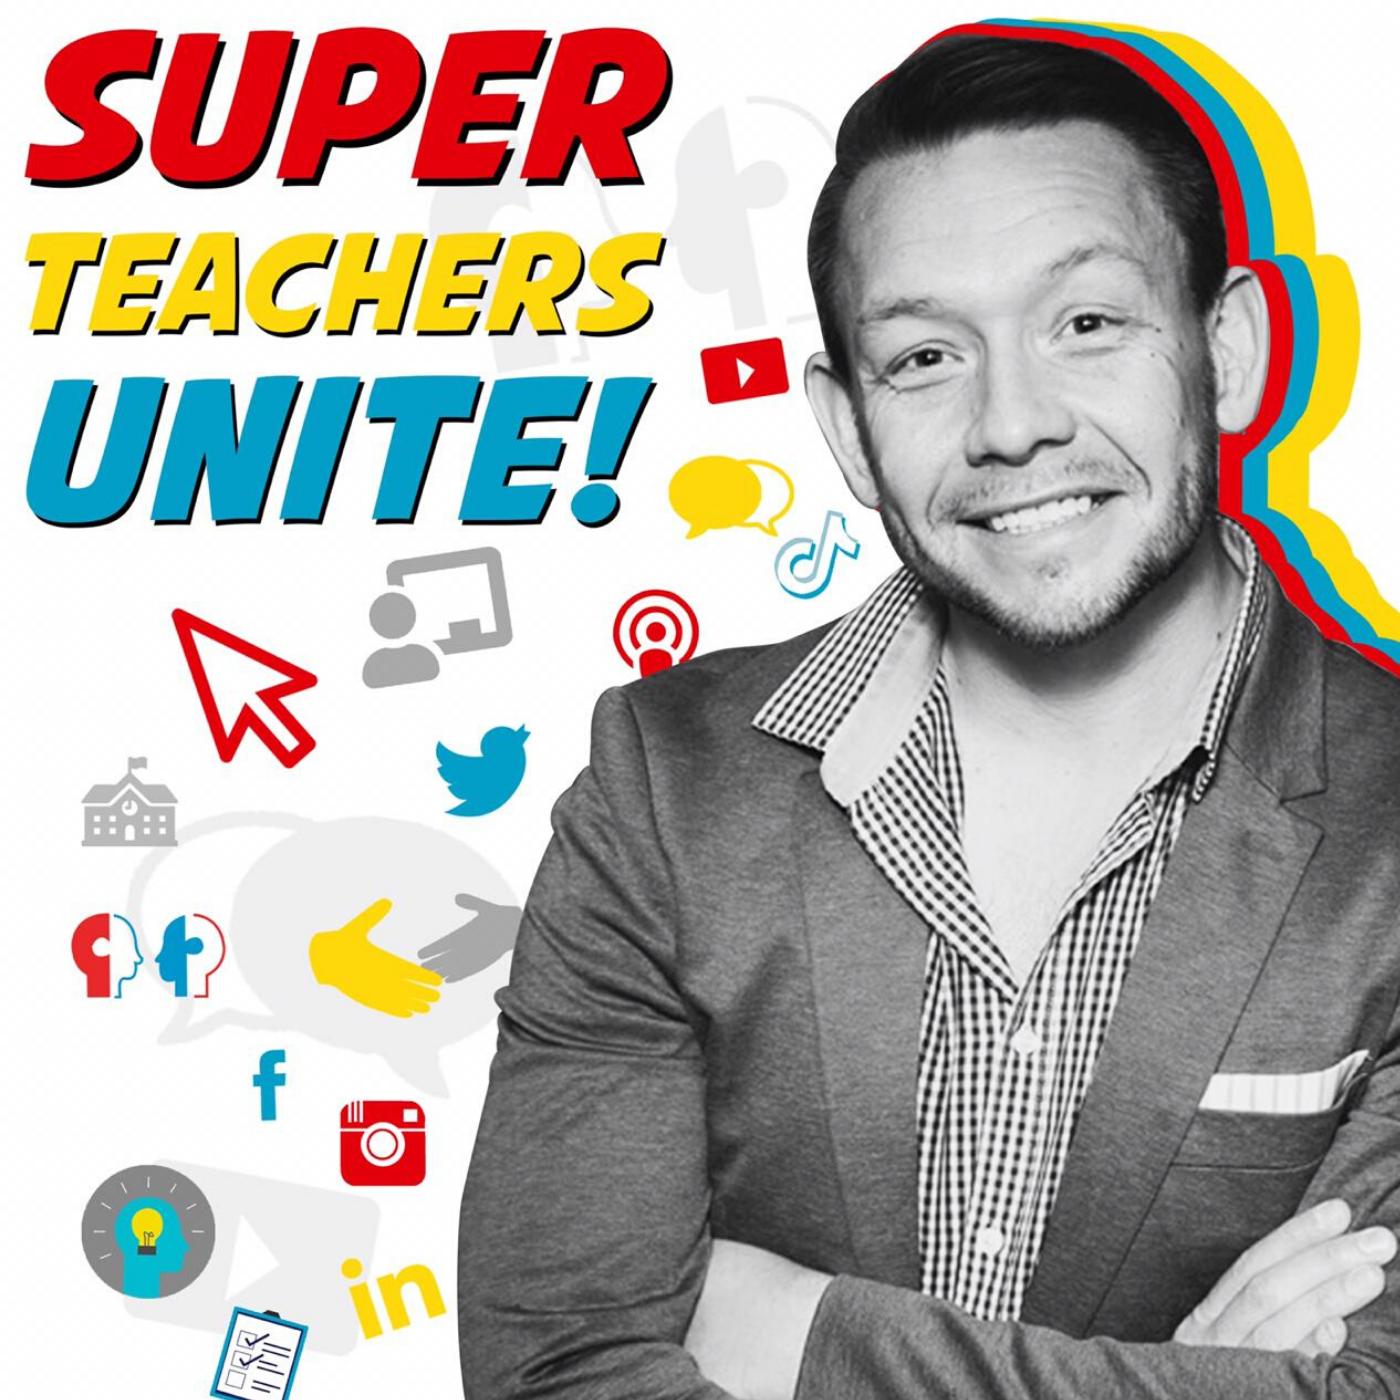 Super Teachers Unite Image